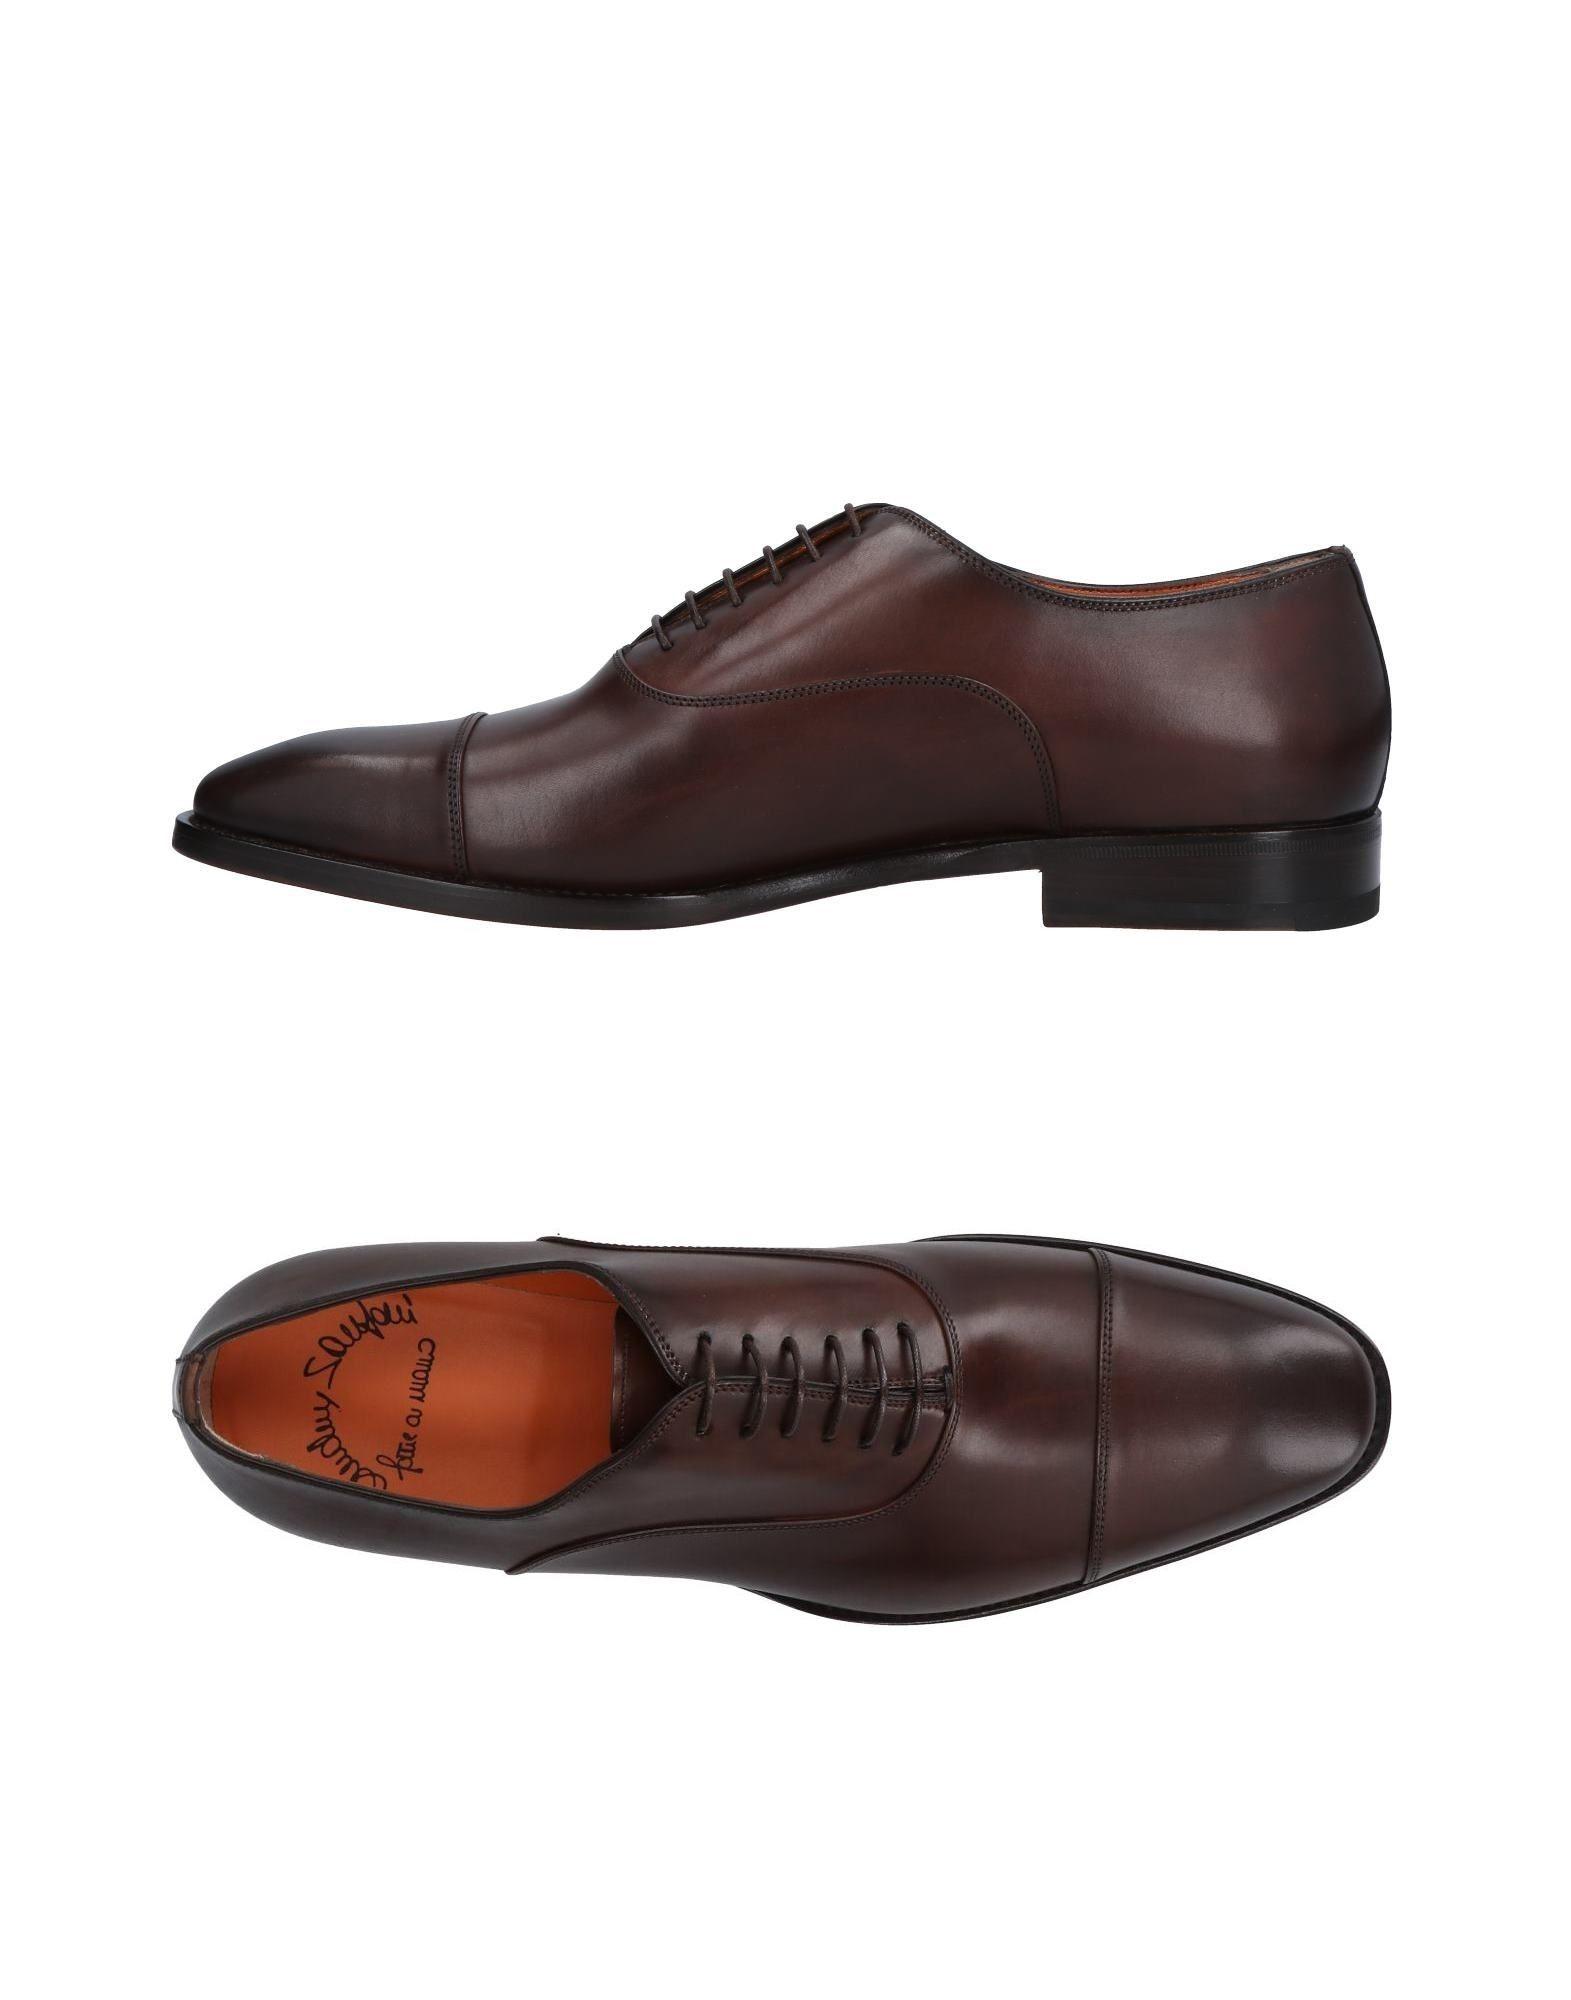 Santoni Schnürschuhe Herren  11478766AA Gute Qualität beliebte Schuhe